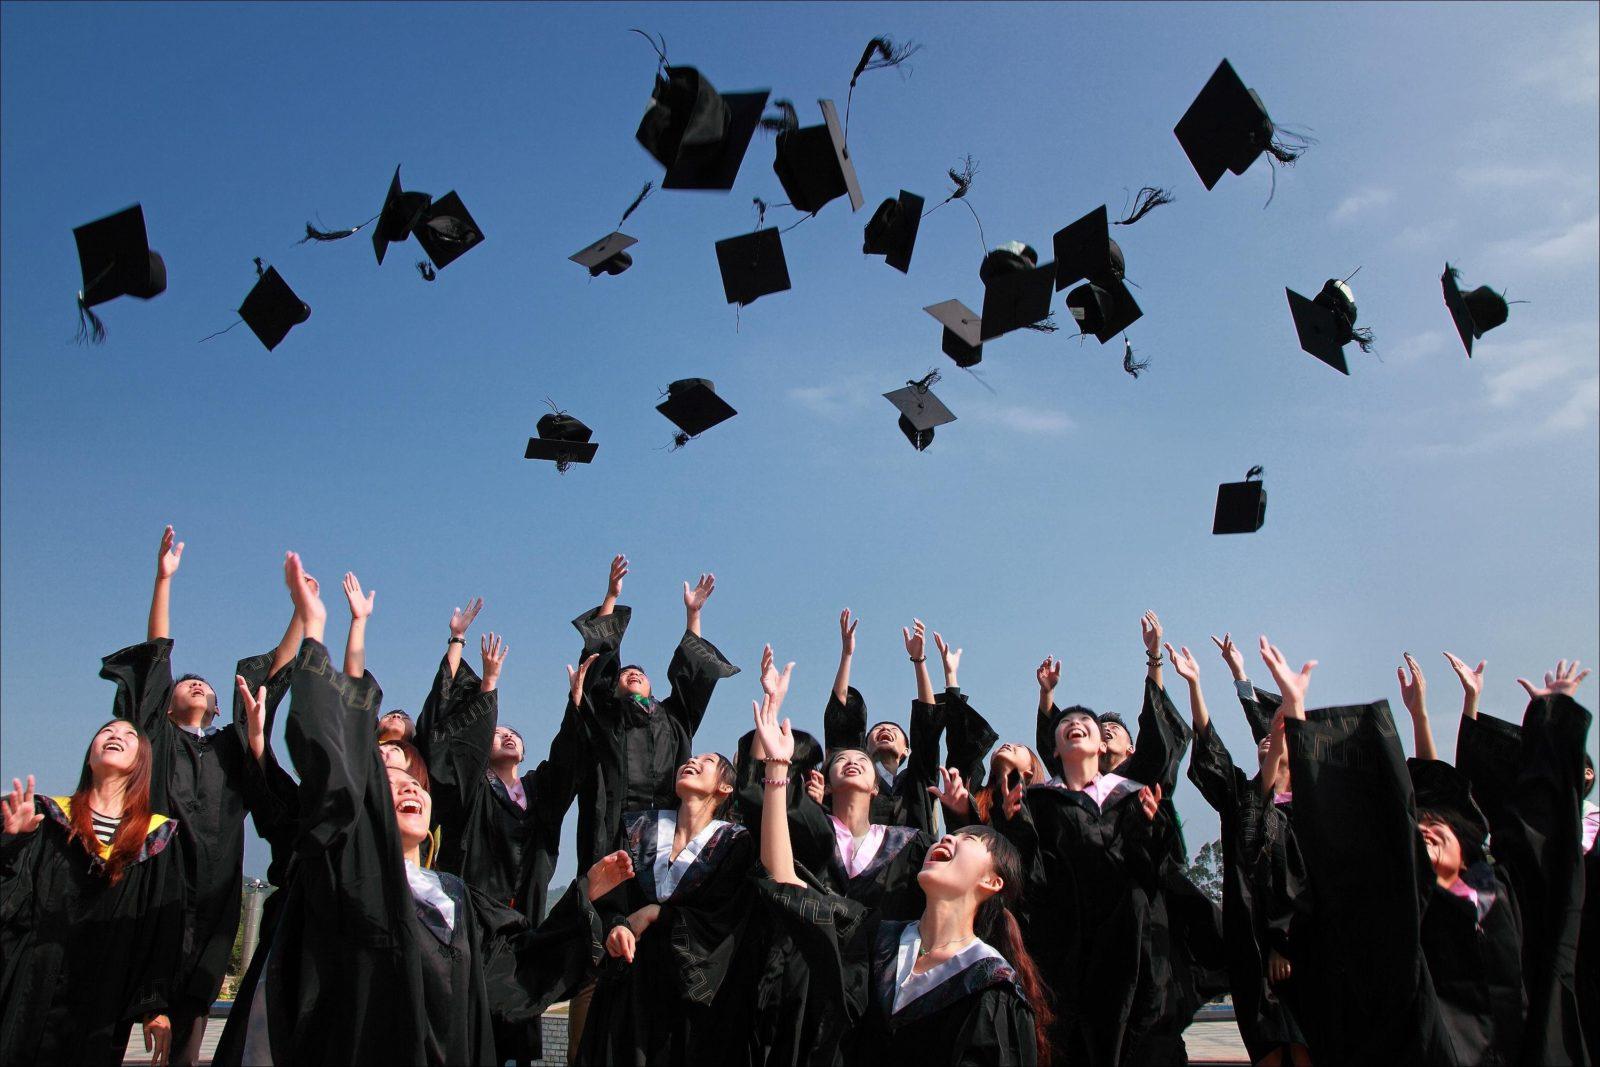 Grads Throw Caps in the Air